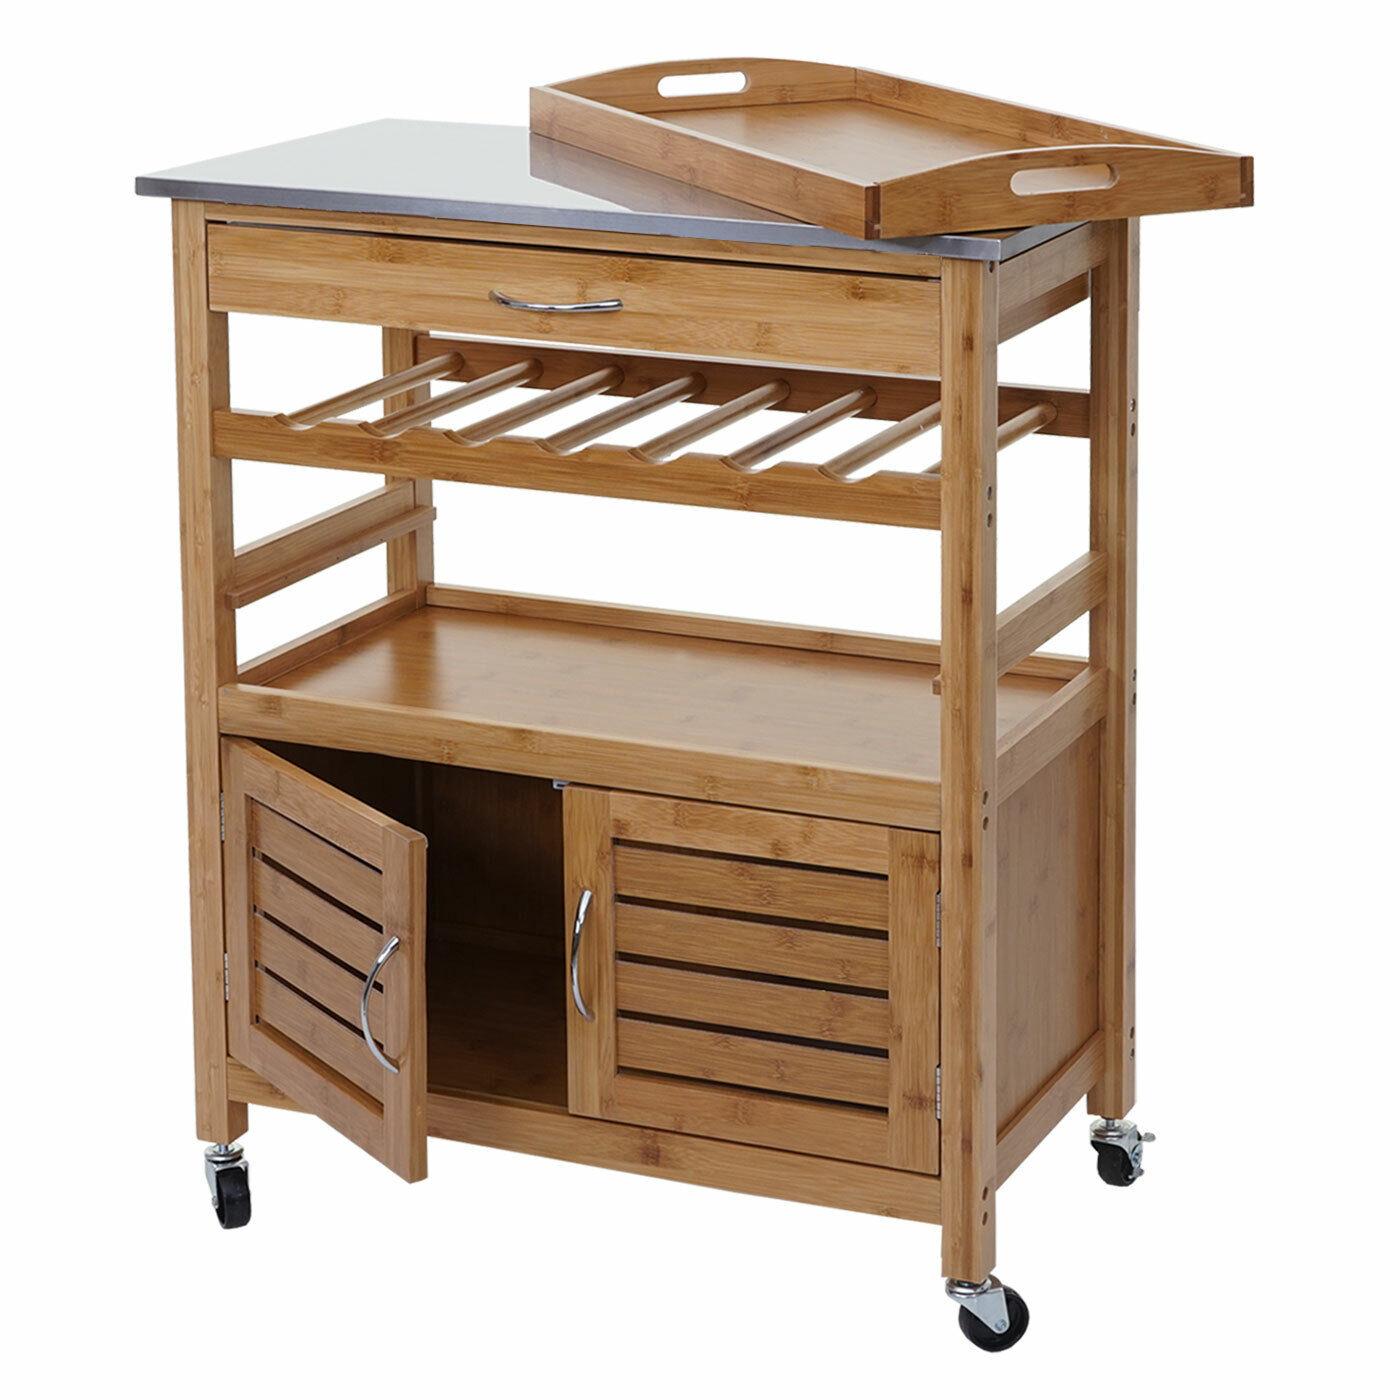 Trolley hwc-d15, Bar Kitchen Helper, Bamboo Stainless Steel Plate, 89x70x37cm